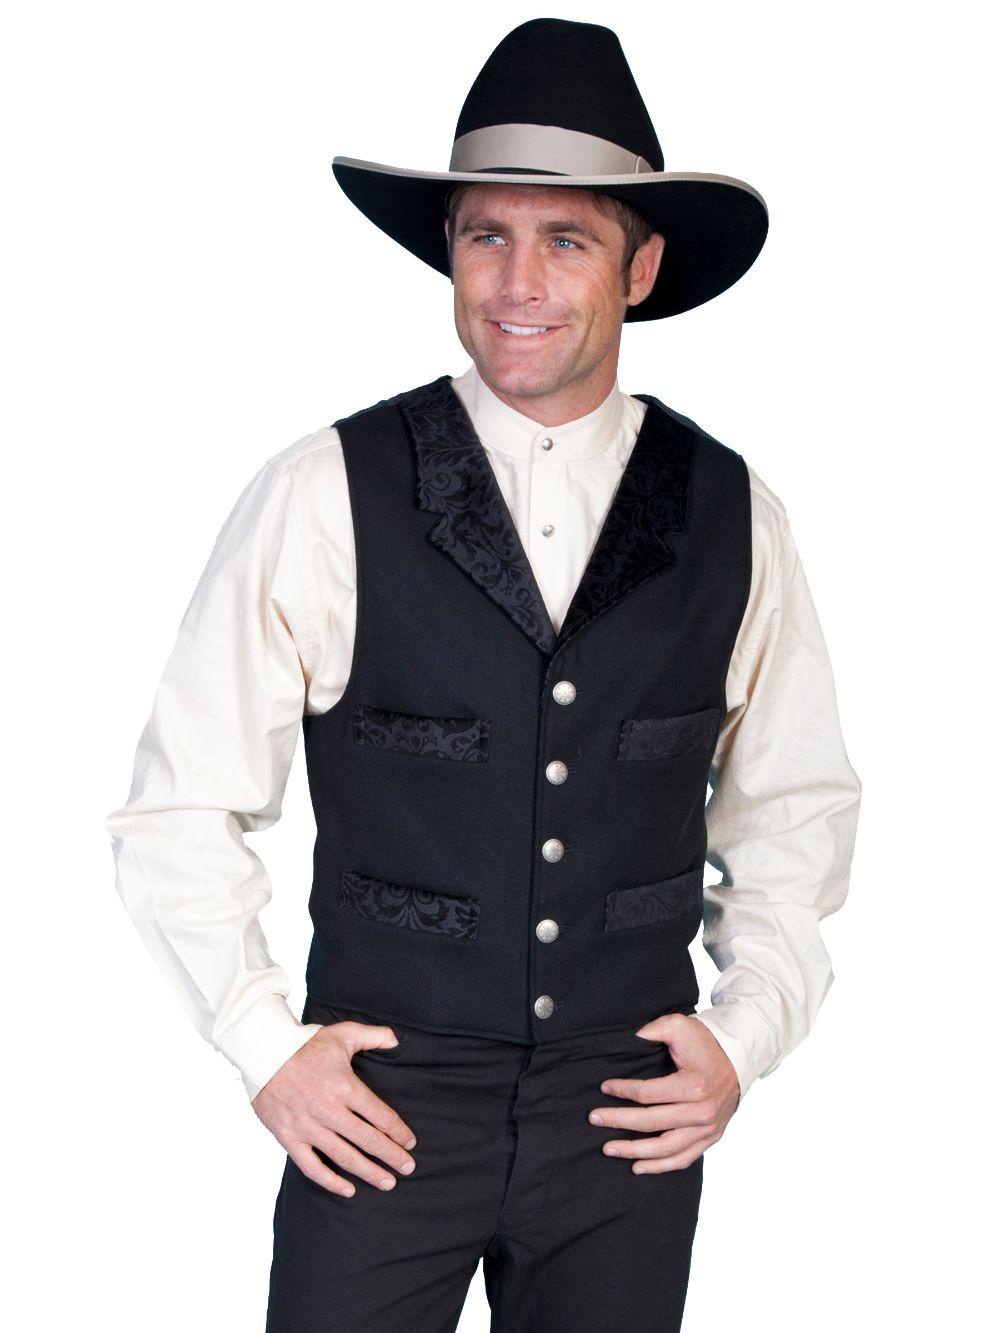 4 Pocket Wool Vest W/Cont. - 511024 - Black. (ships in 1-2 days). #F0_511024_BLK